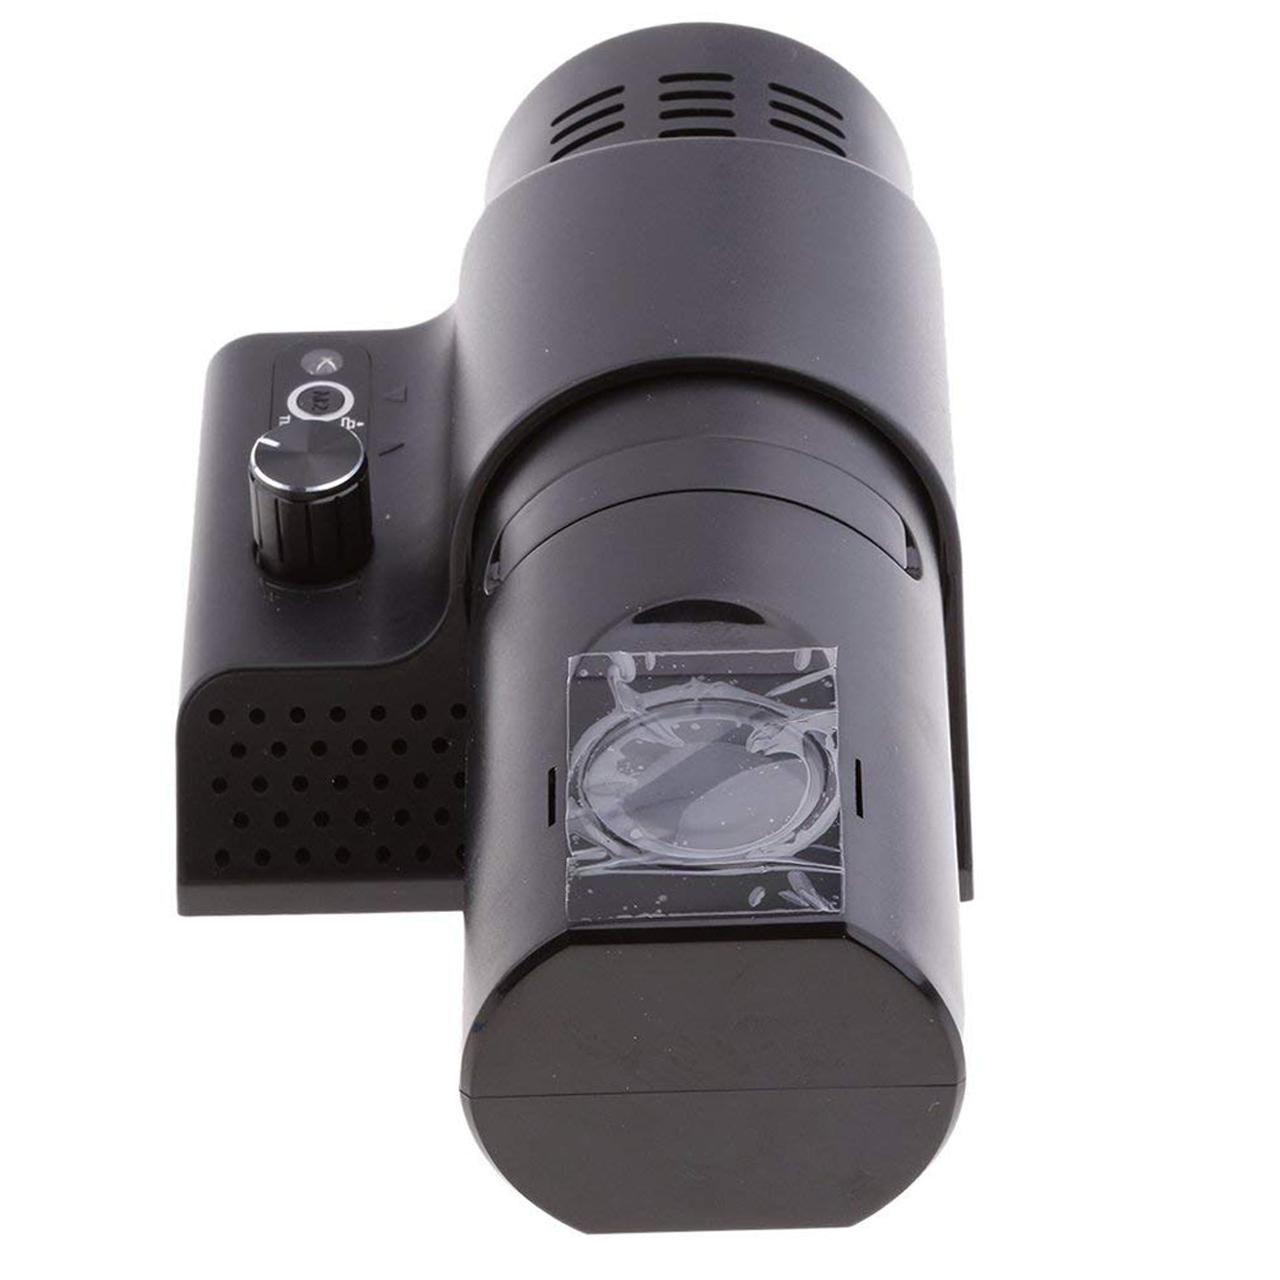 ساعت پروژکتوری مدل X Projector